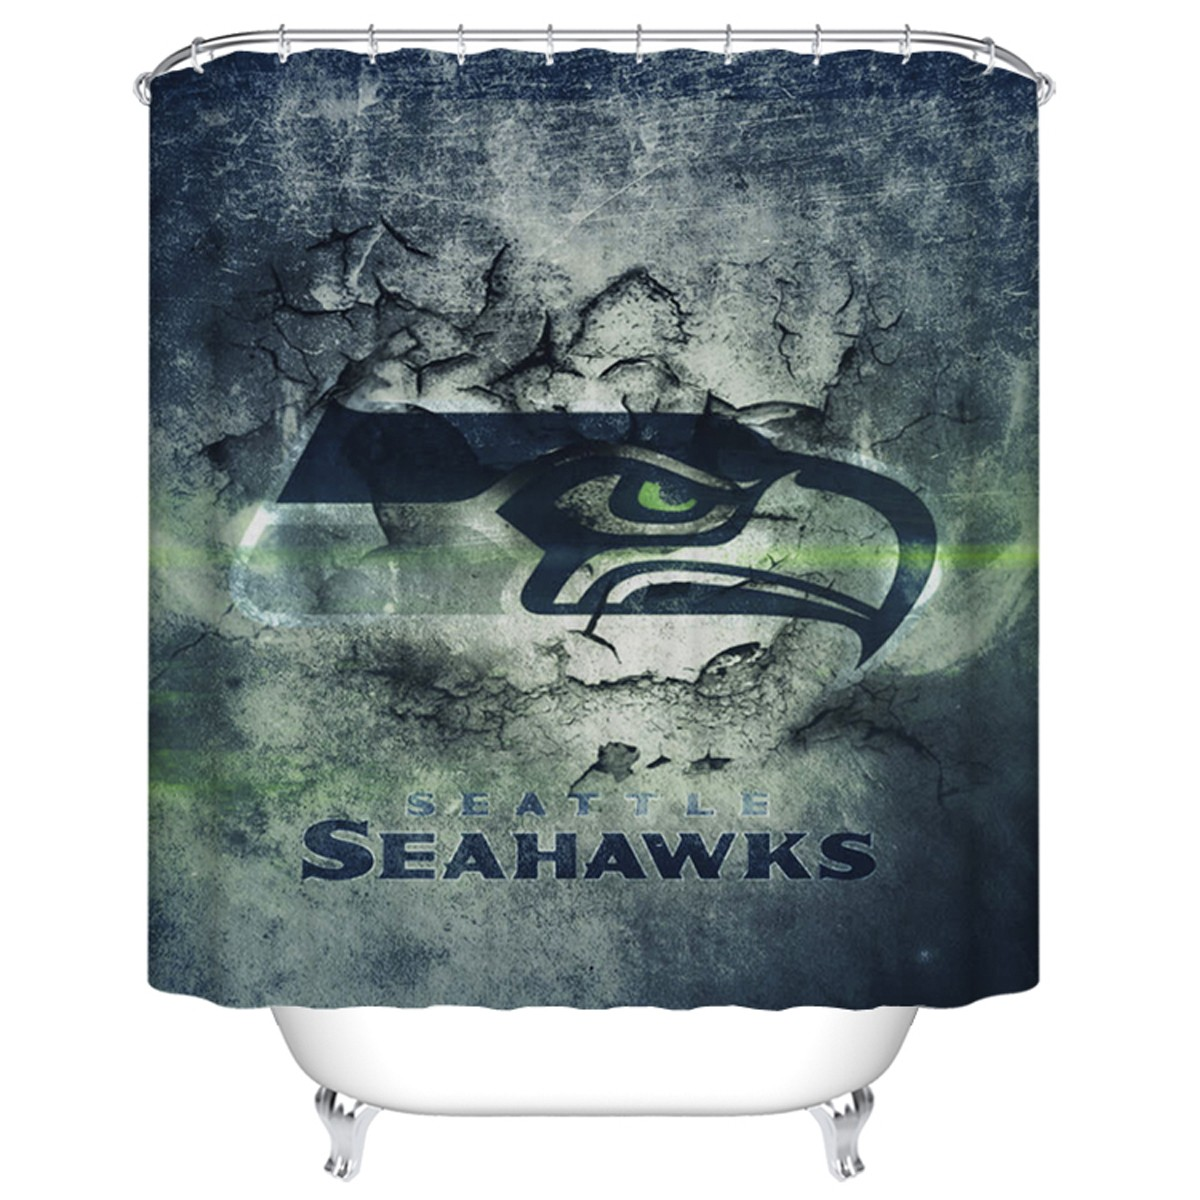 "Fashionable Bathroom Waterproof Shower Curtain, 70"" W x 72"" H (DK-YT019)"